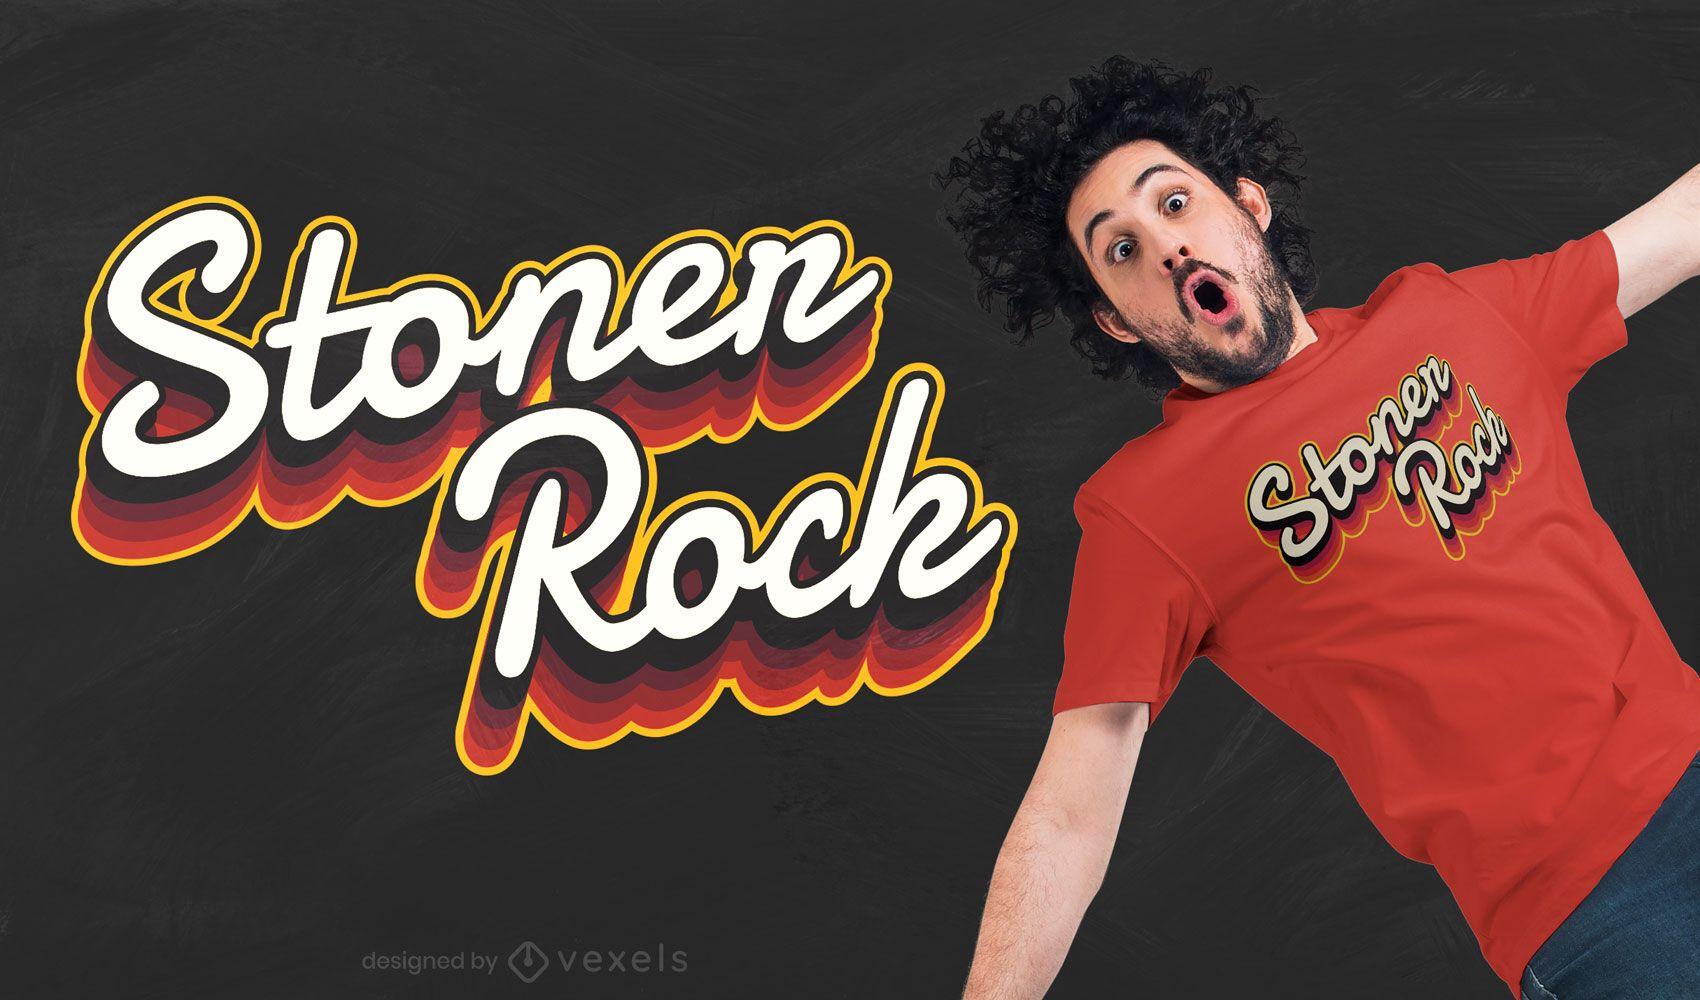 Stoner rock t-shirt design